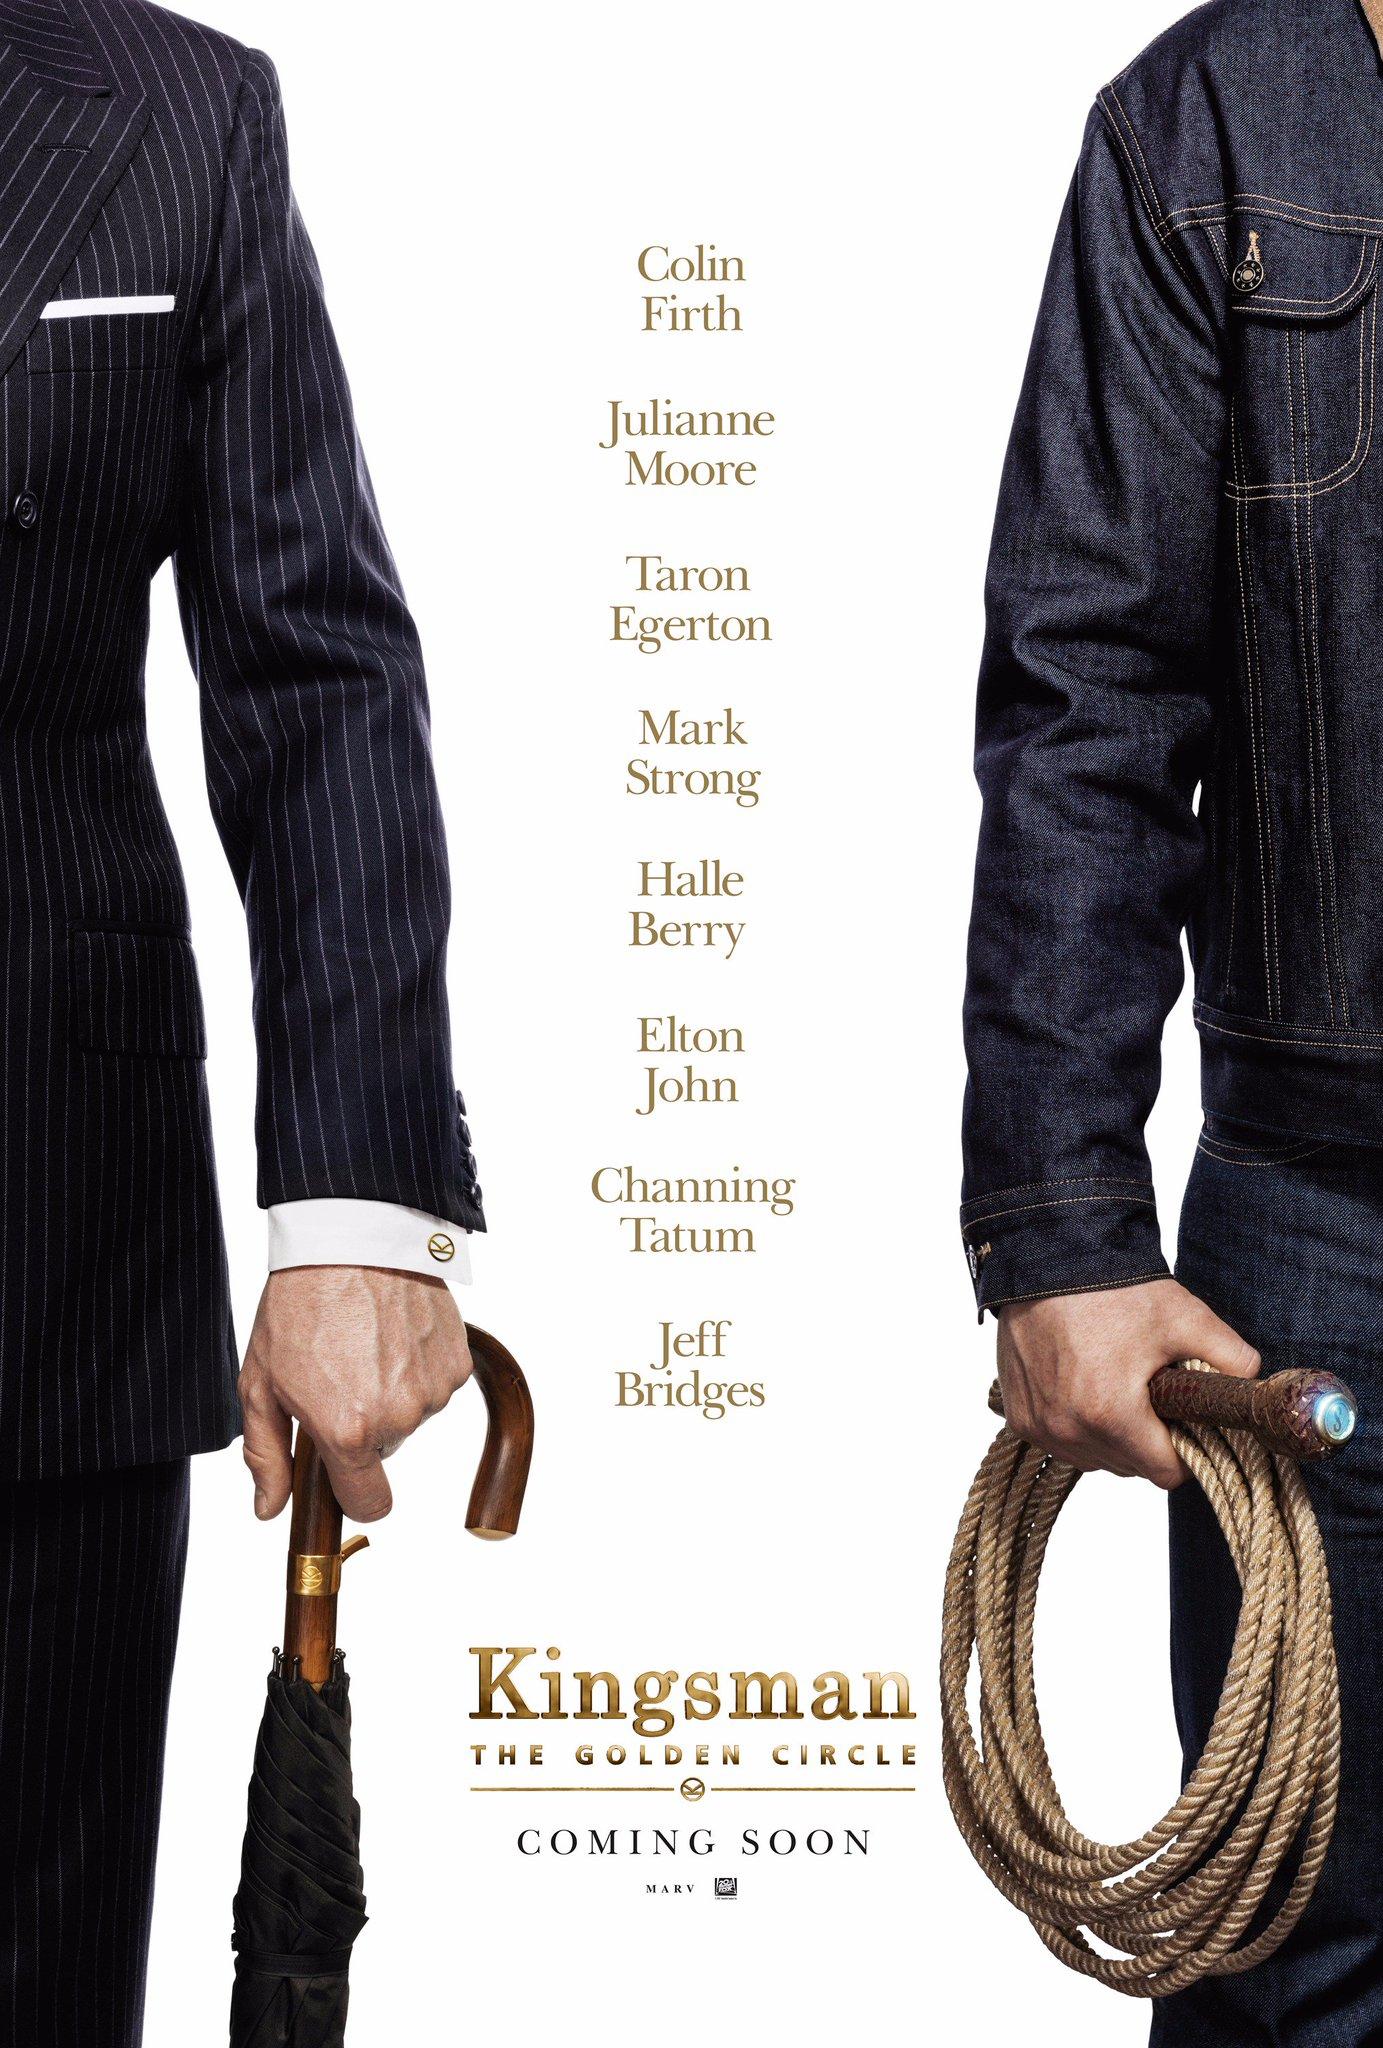 [En cartelera] Kingsman: The Golden Circle C8KuTzCUwAAMzes